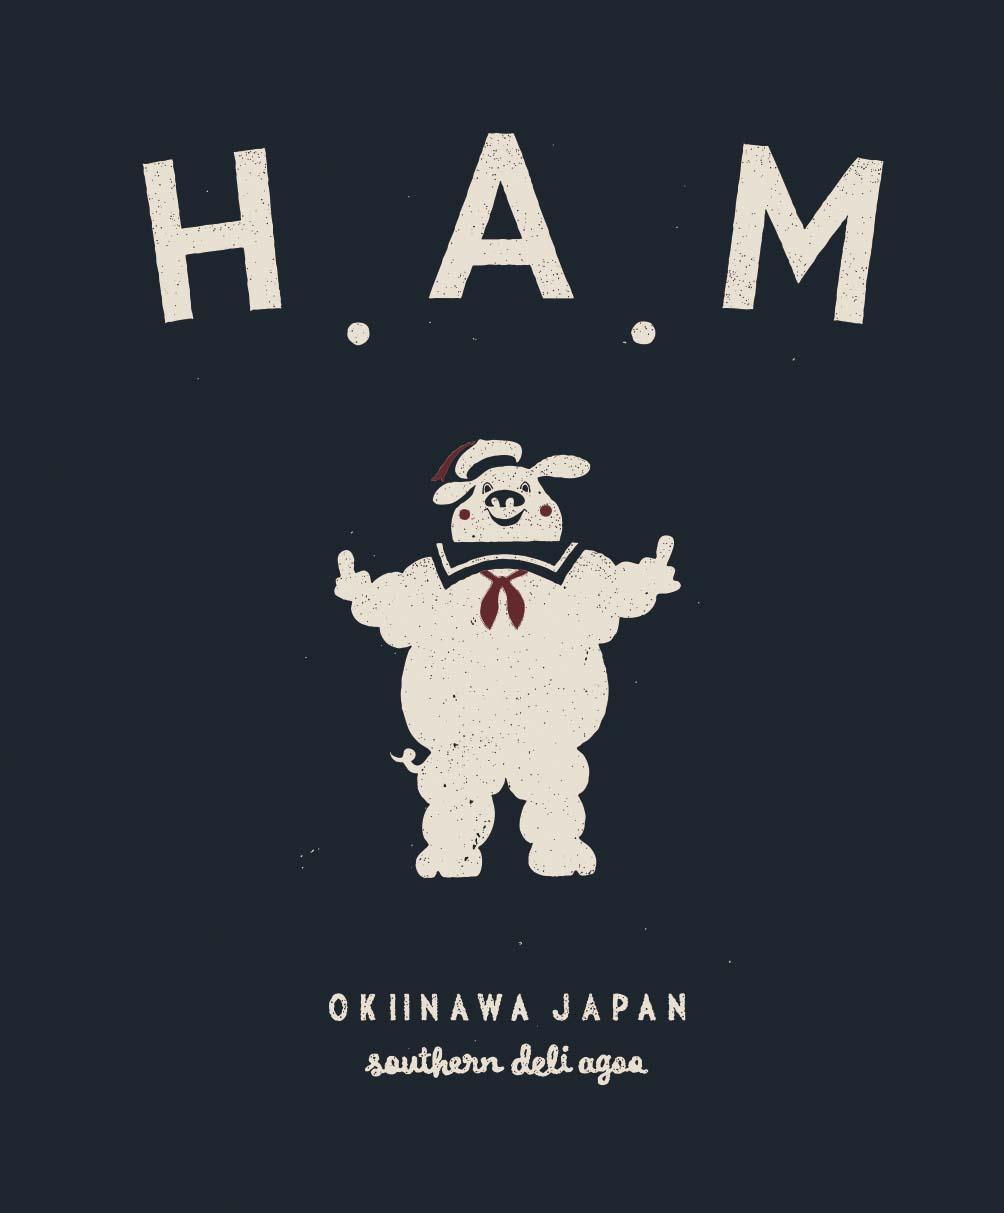 H.A.M